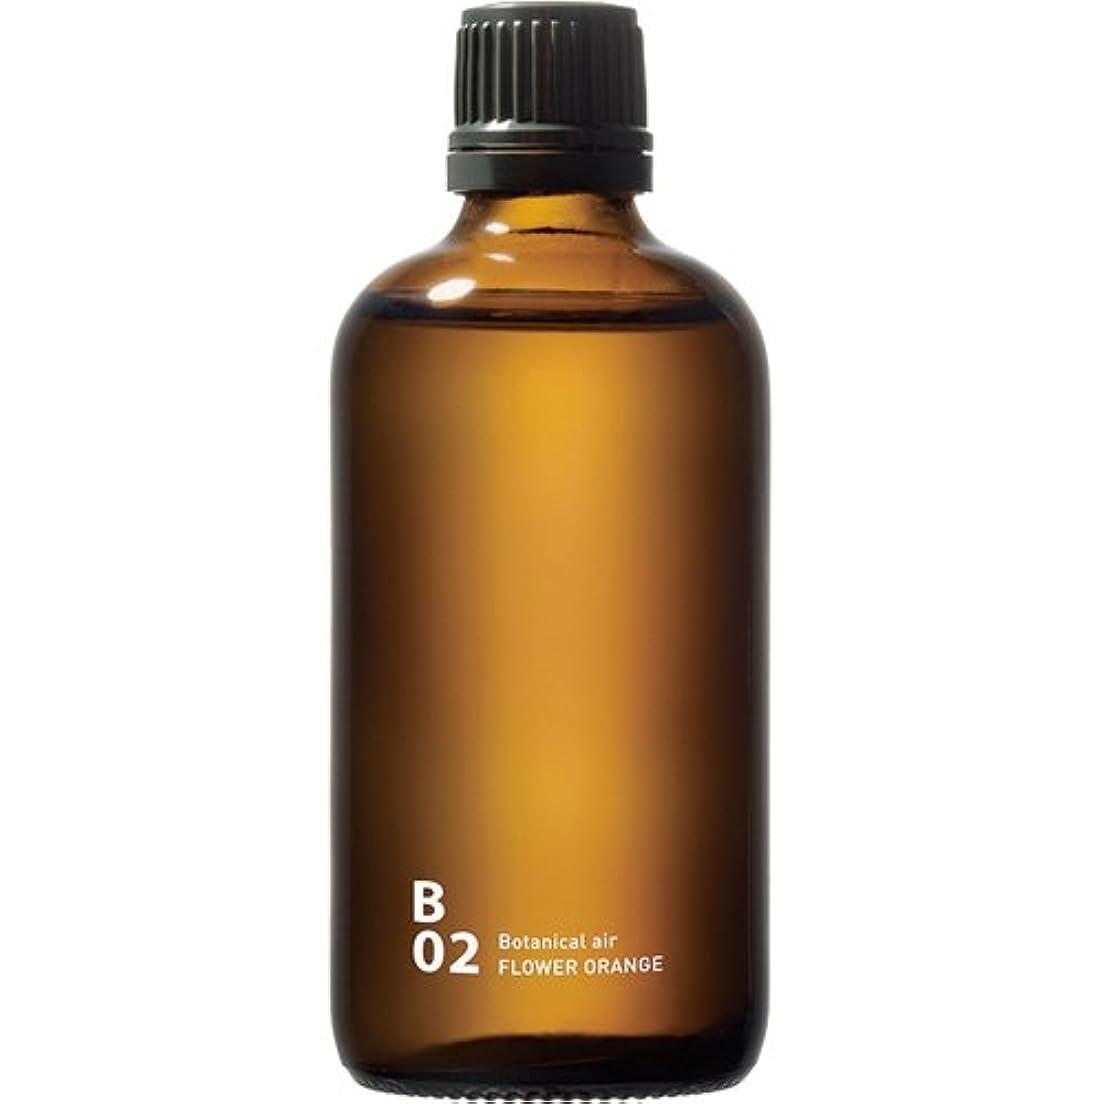 便利さ医学侵入B02 FLOWER ORANGE piezo aroma oil 100ml